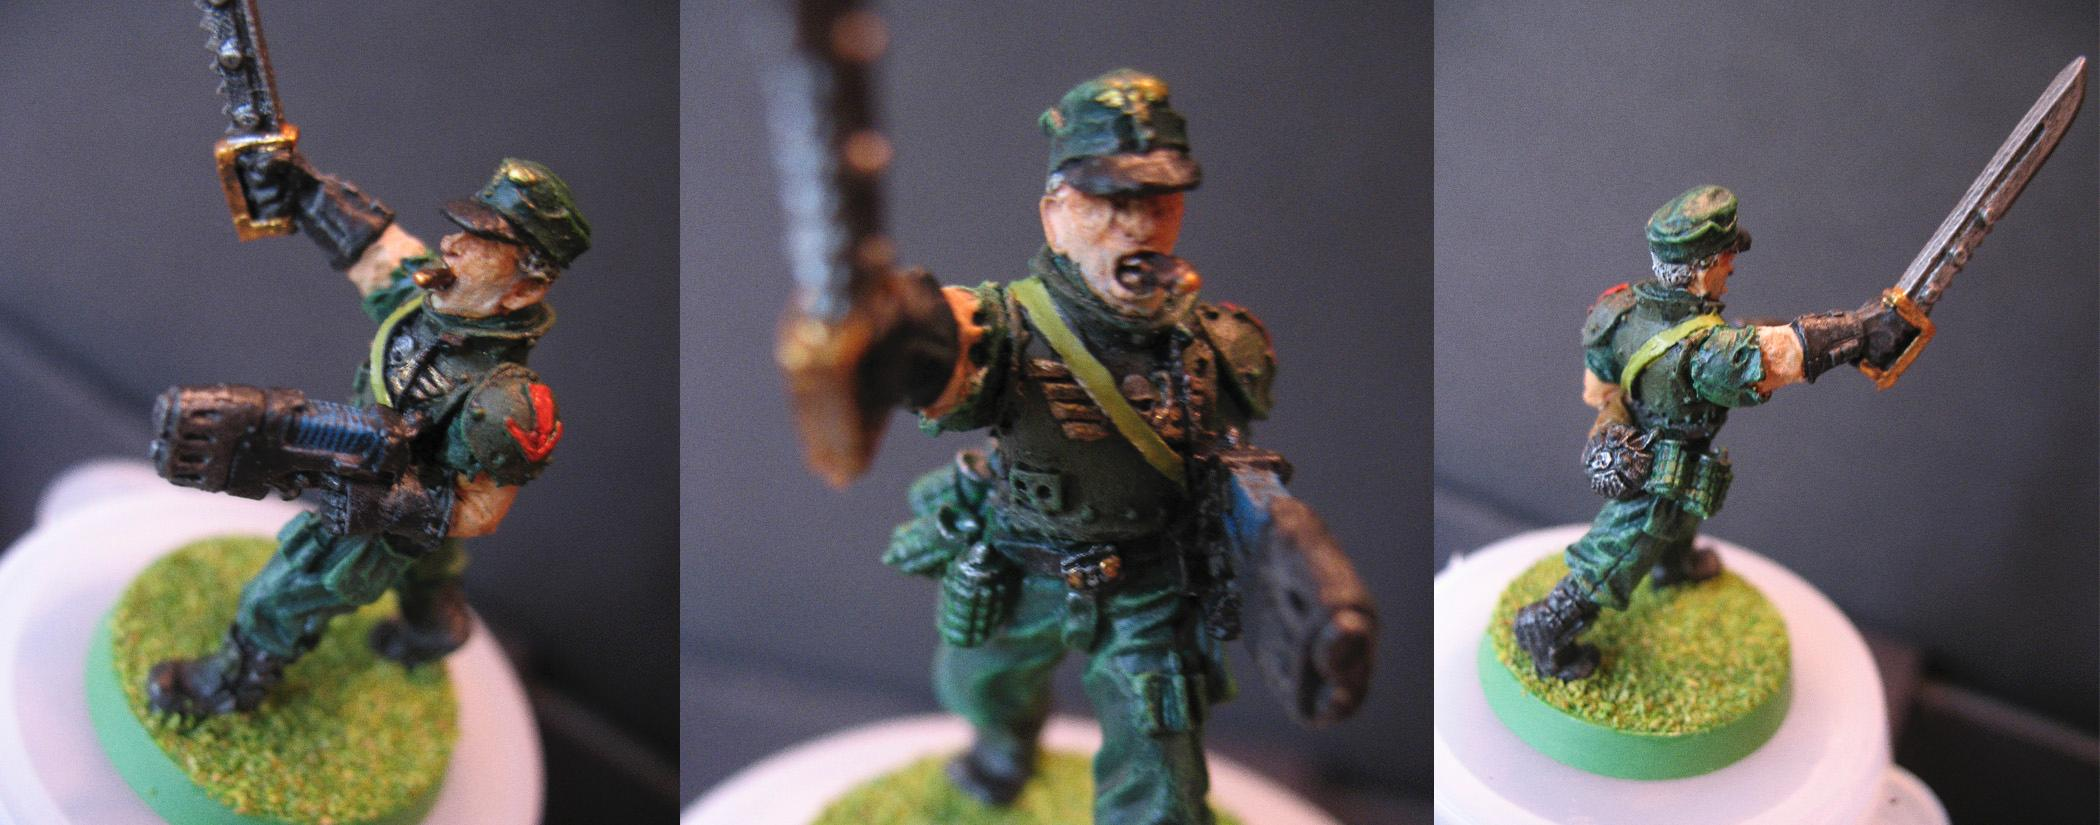 Col  Schaeffer, Col Schaeffer, Imperial Guard, Last Chancers, Penal Custodian, Penal Legion